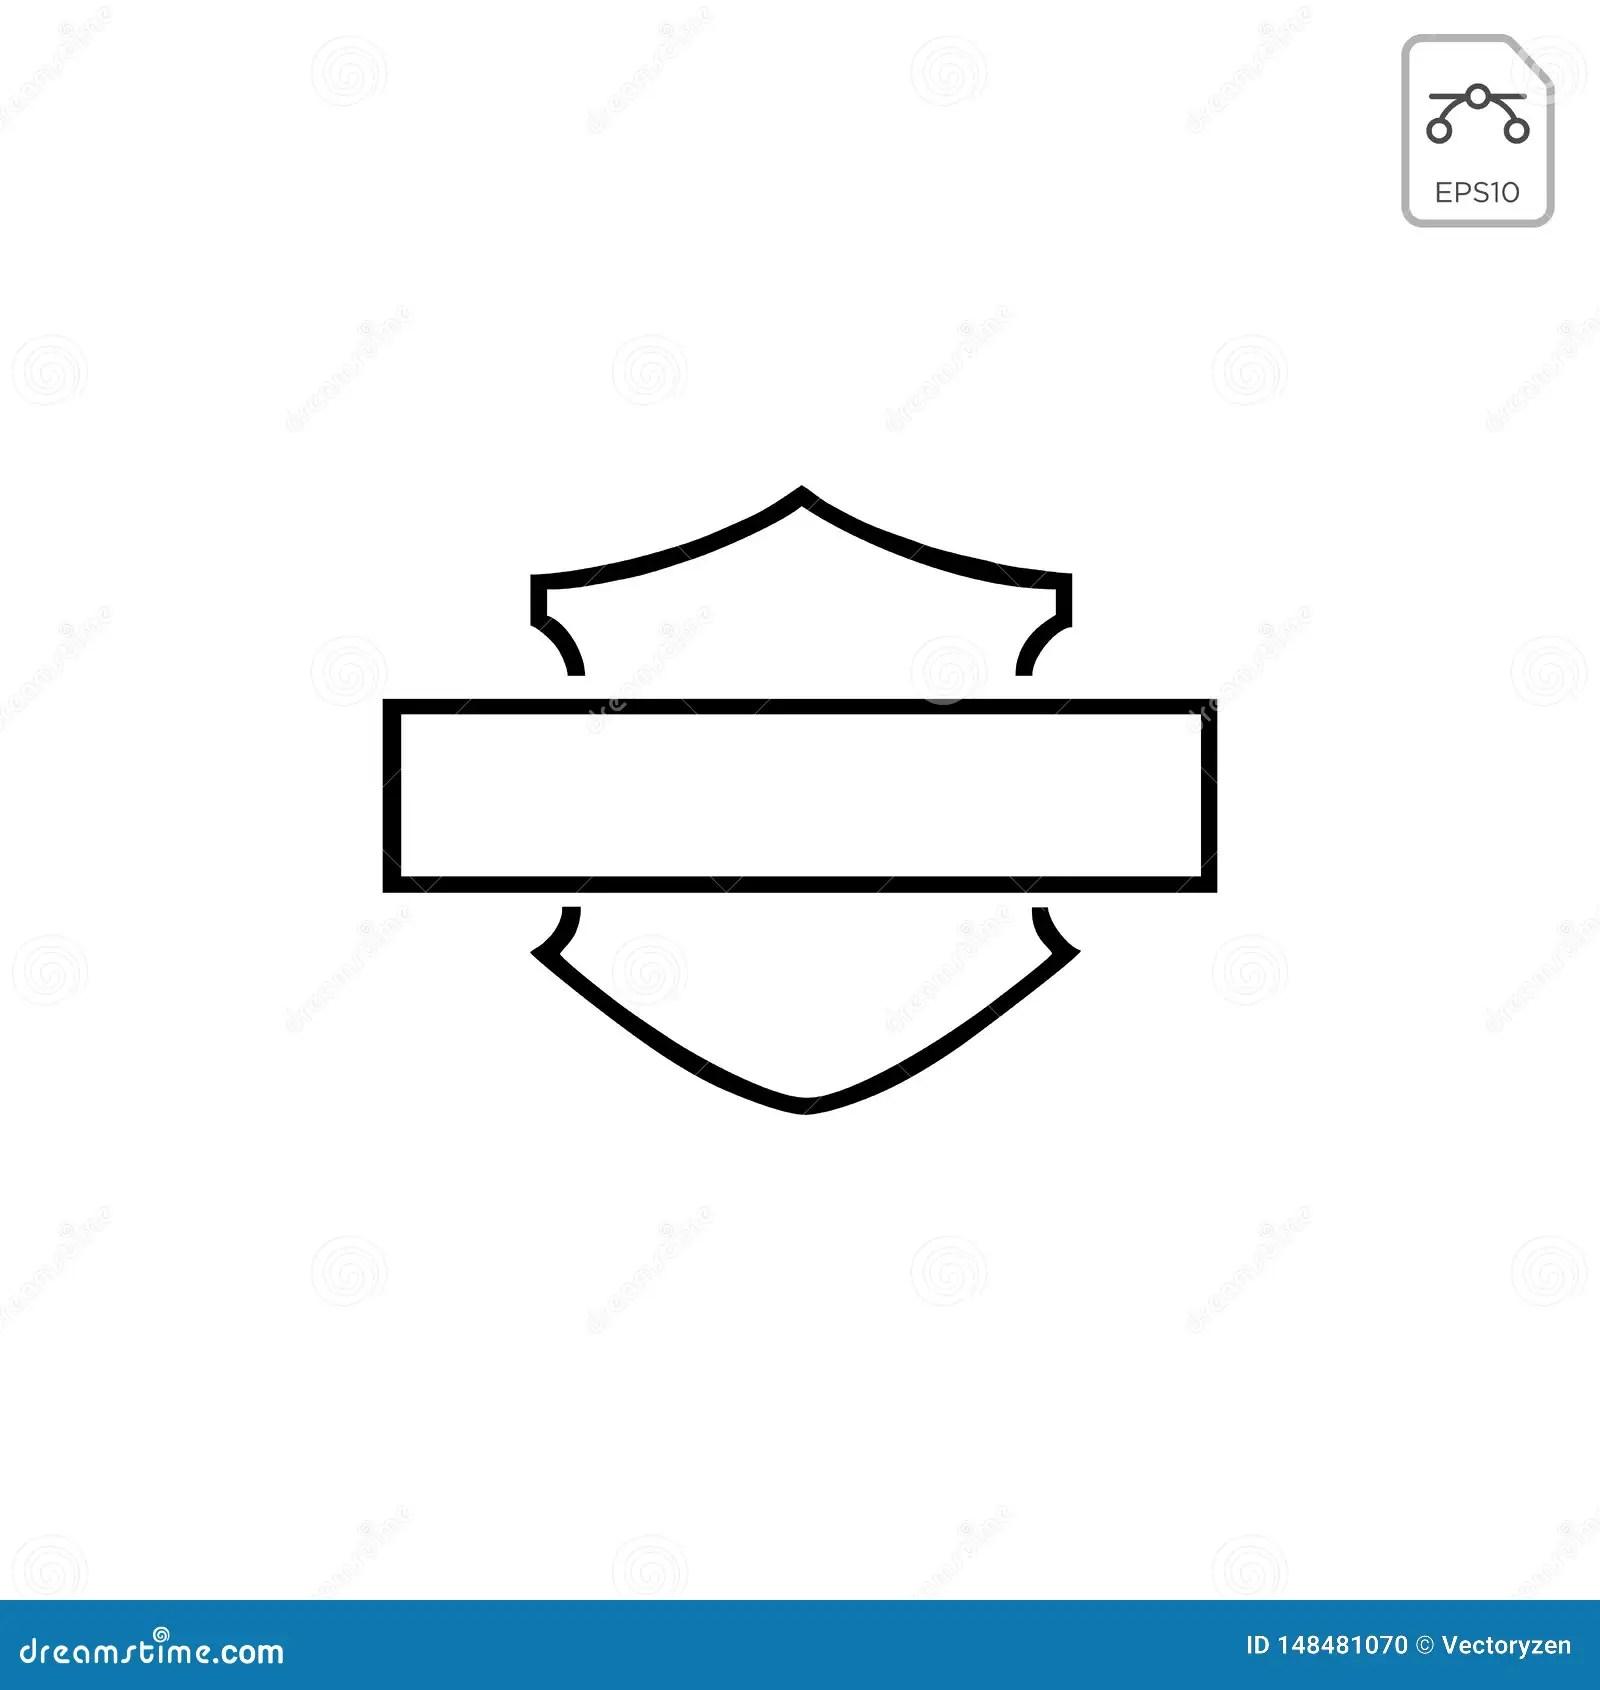 hight resolution of harley davidson emblem or icon abstract vector element isolated motor club illustration silhouette vintage biker wheel old race logo motorbike symbol engine